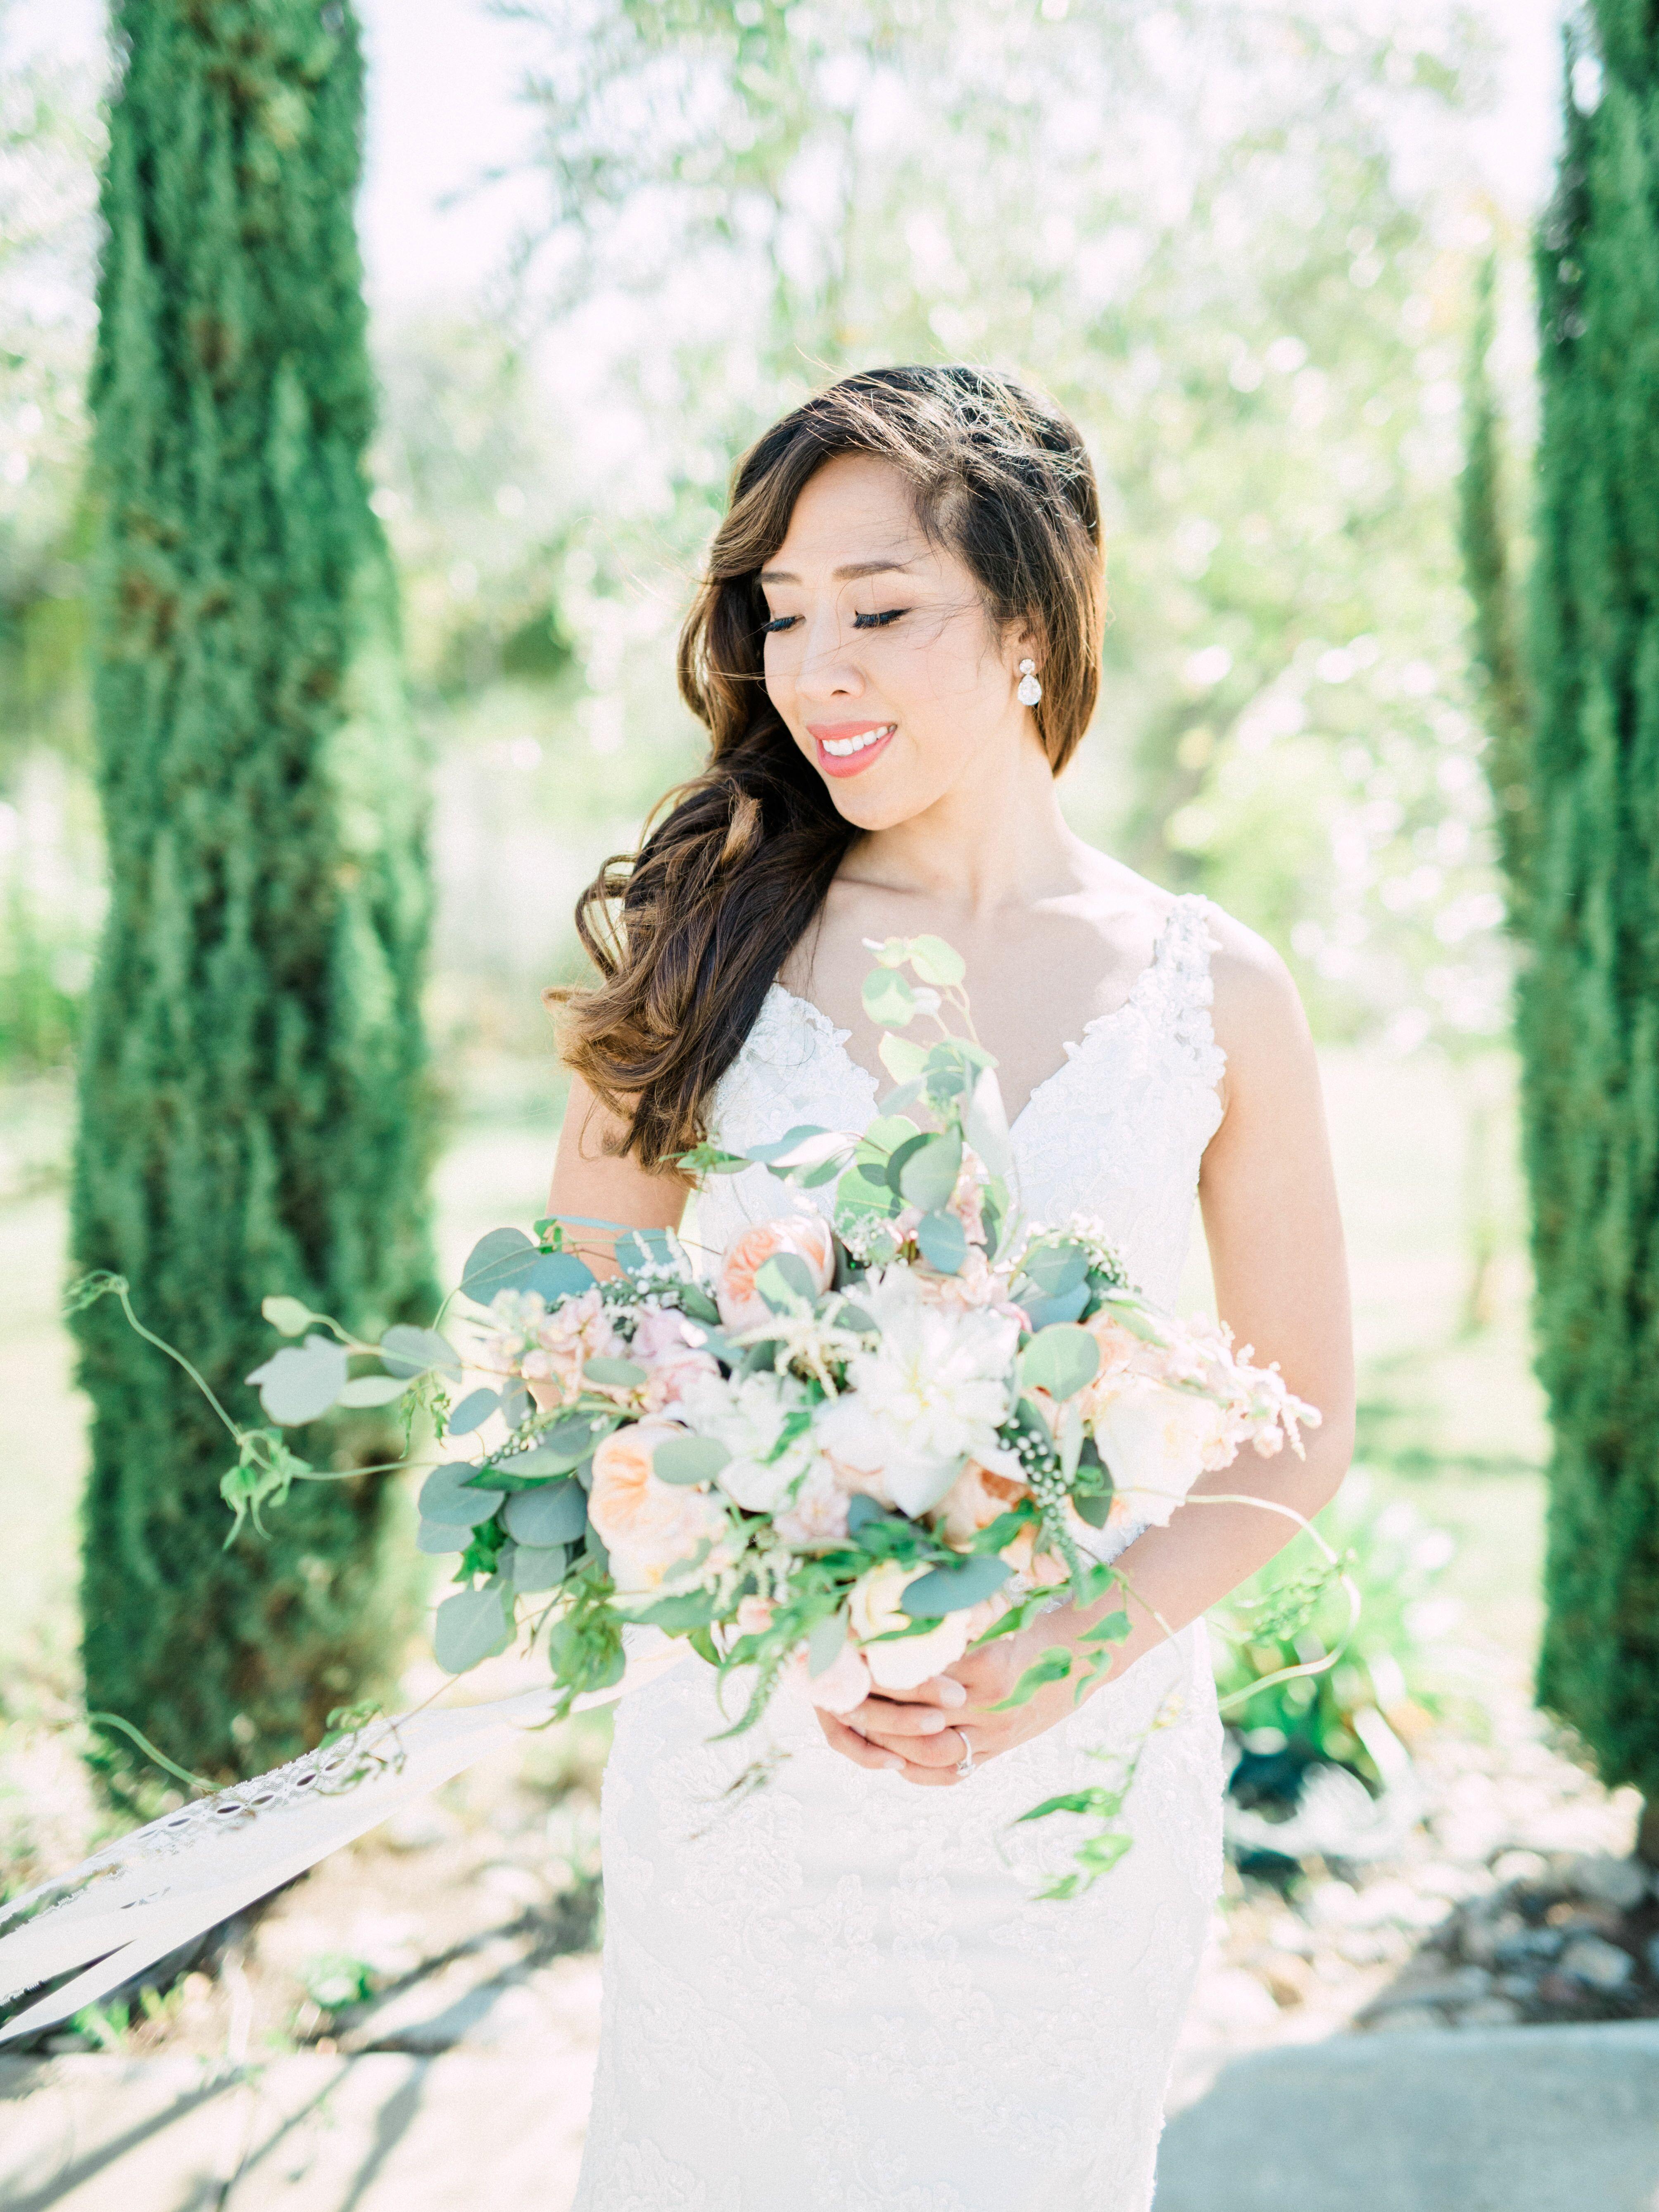 Victoria Toda Beauty